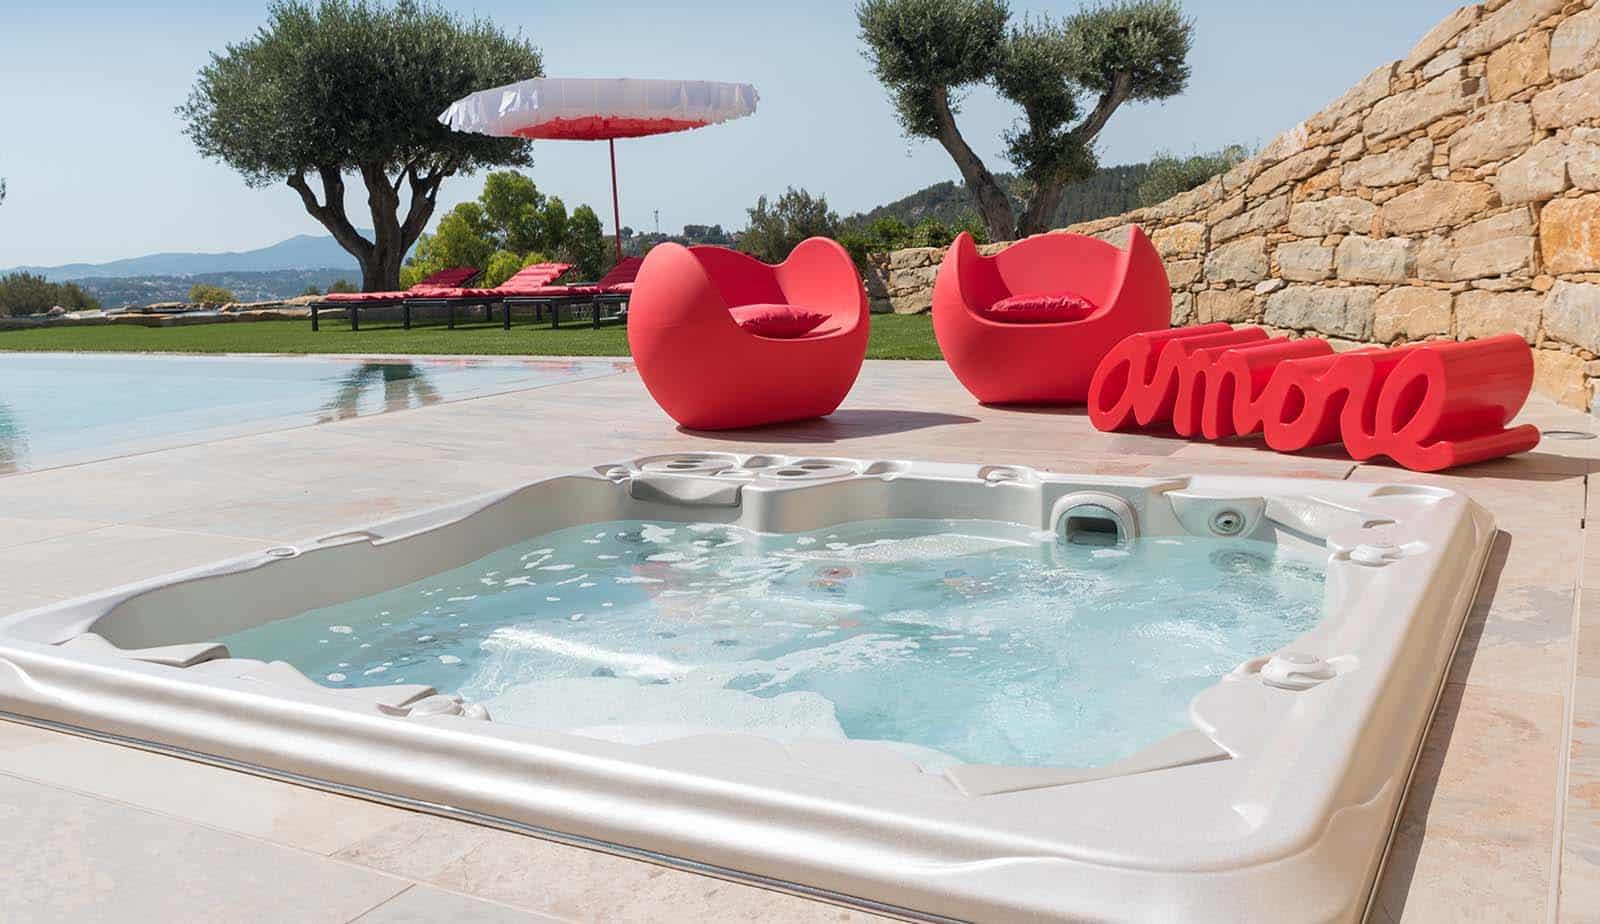 Hot Tubs vs Swimming Pools